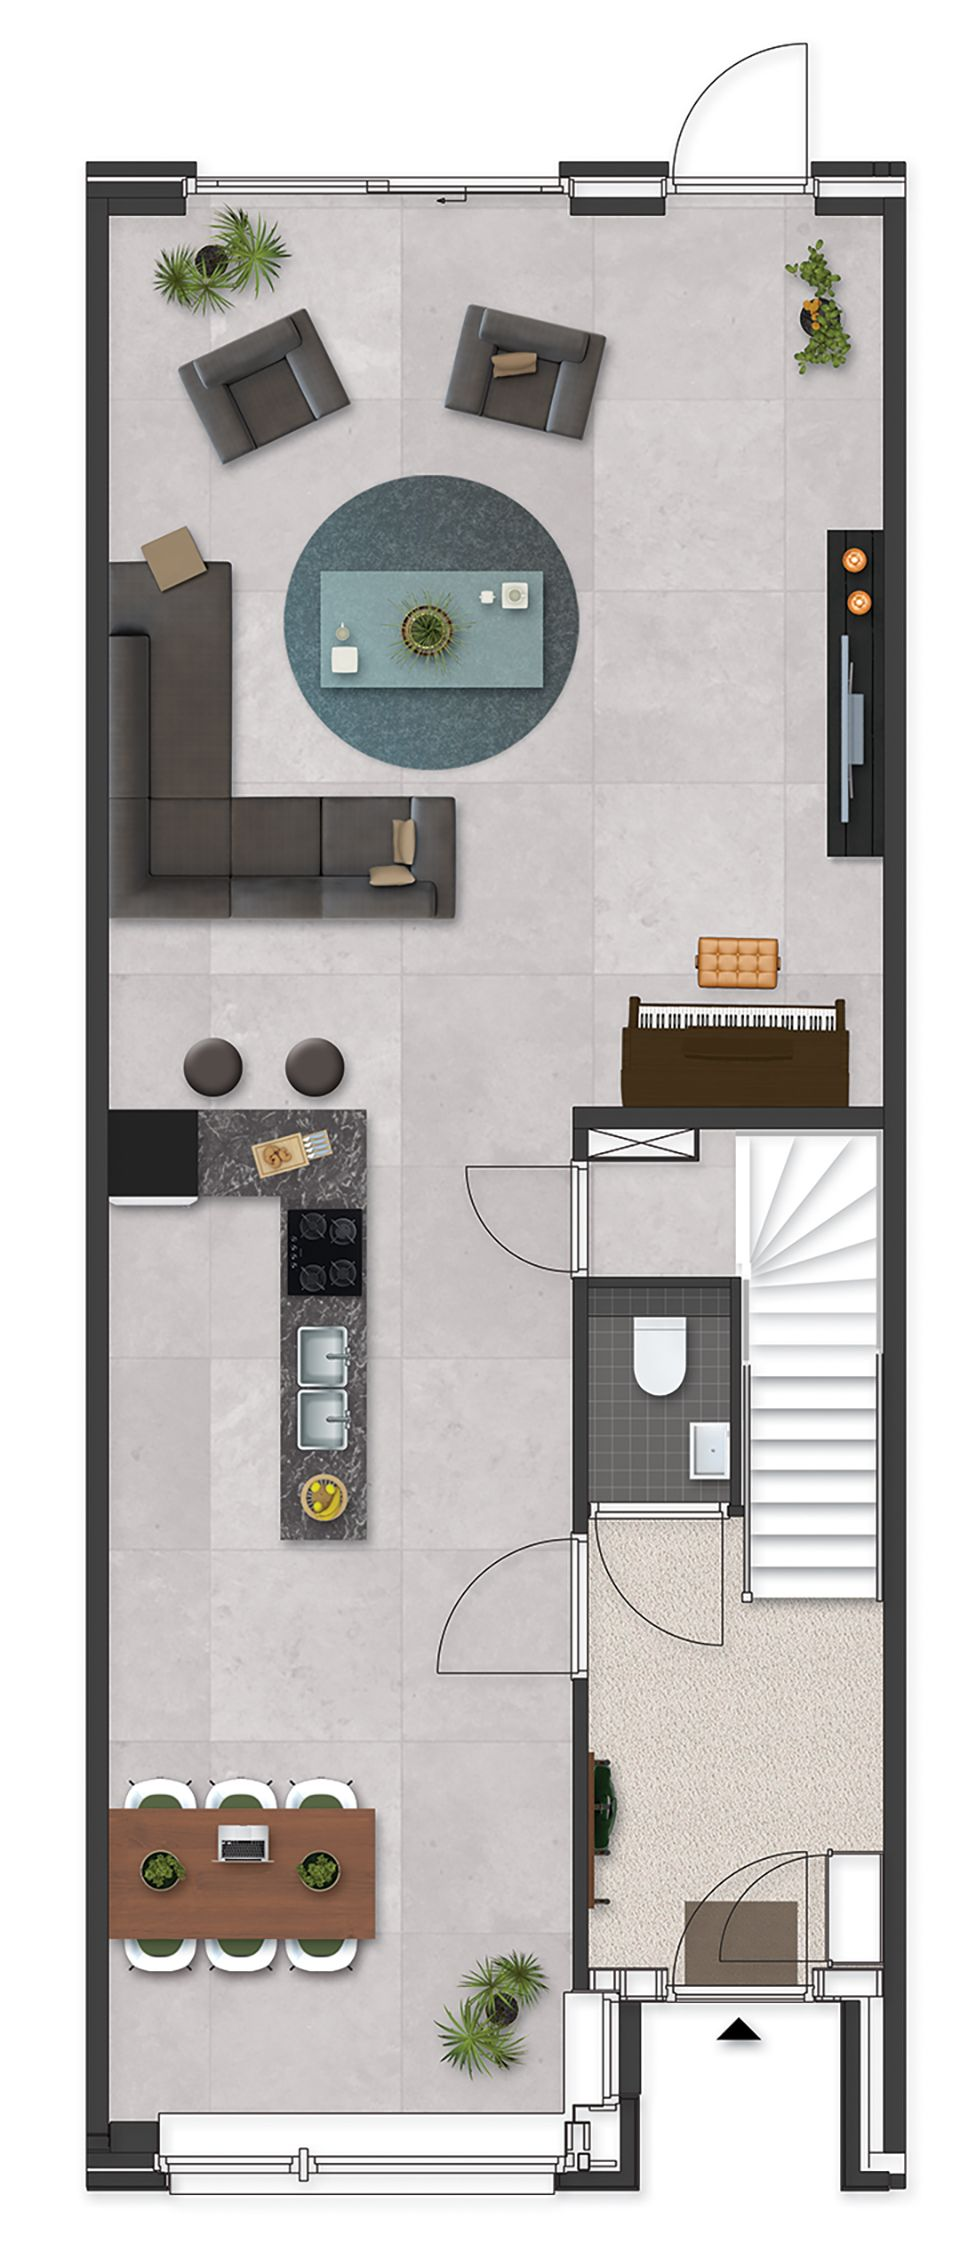 kadewoning  room planning loft ideas small house plans also plan rh pinterest